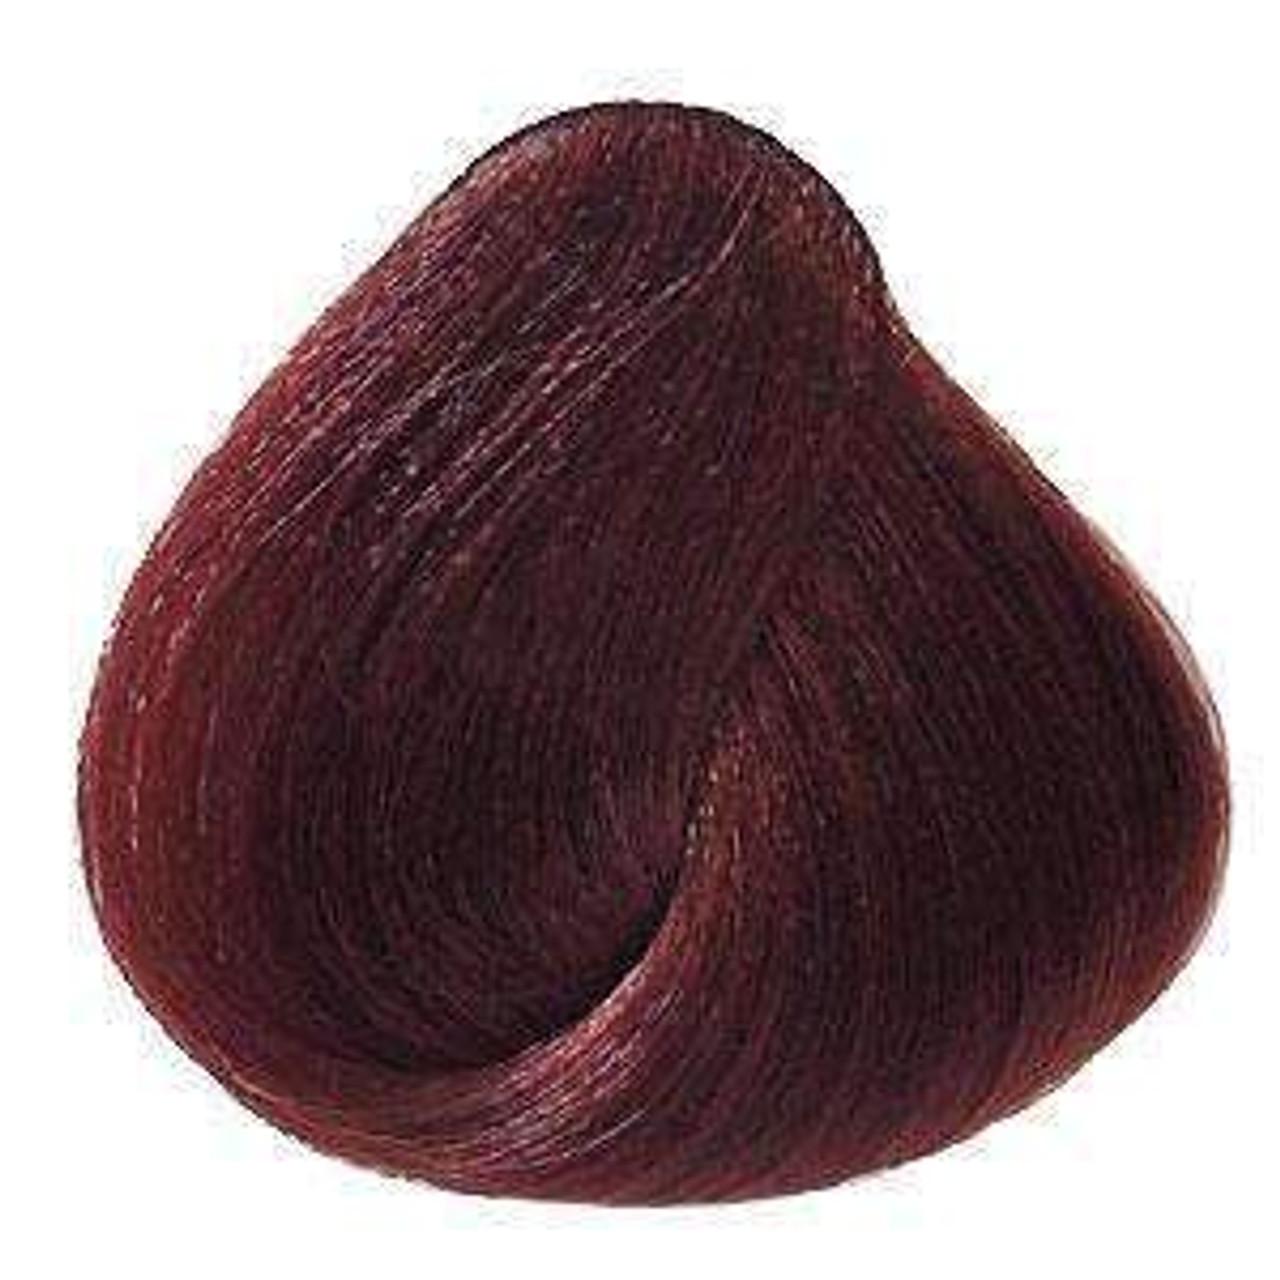 Clairol Beautiful B40W Amethyst Hair Color